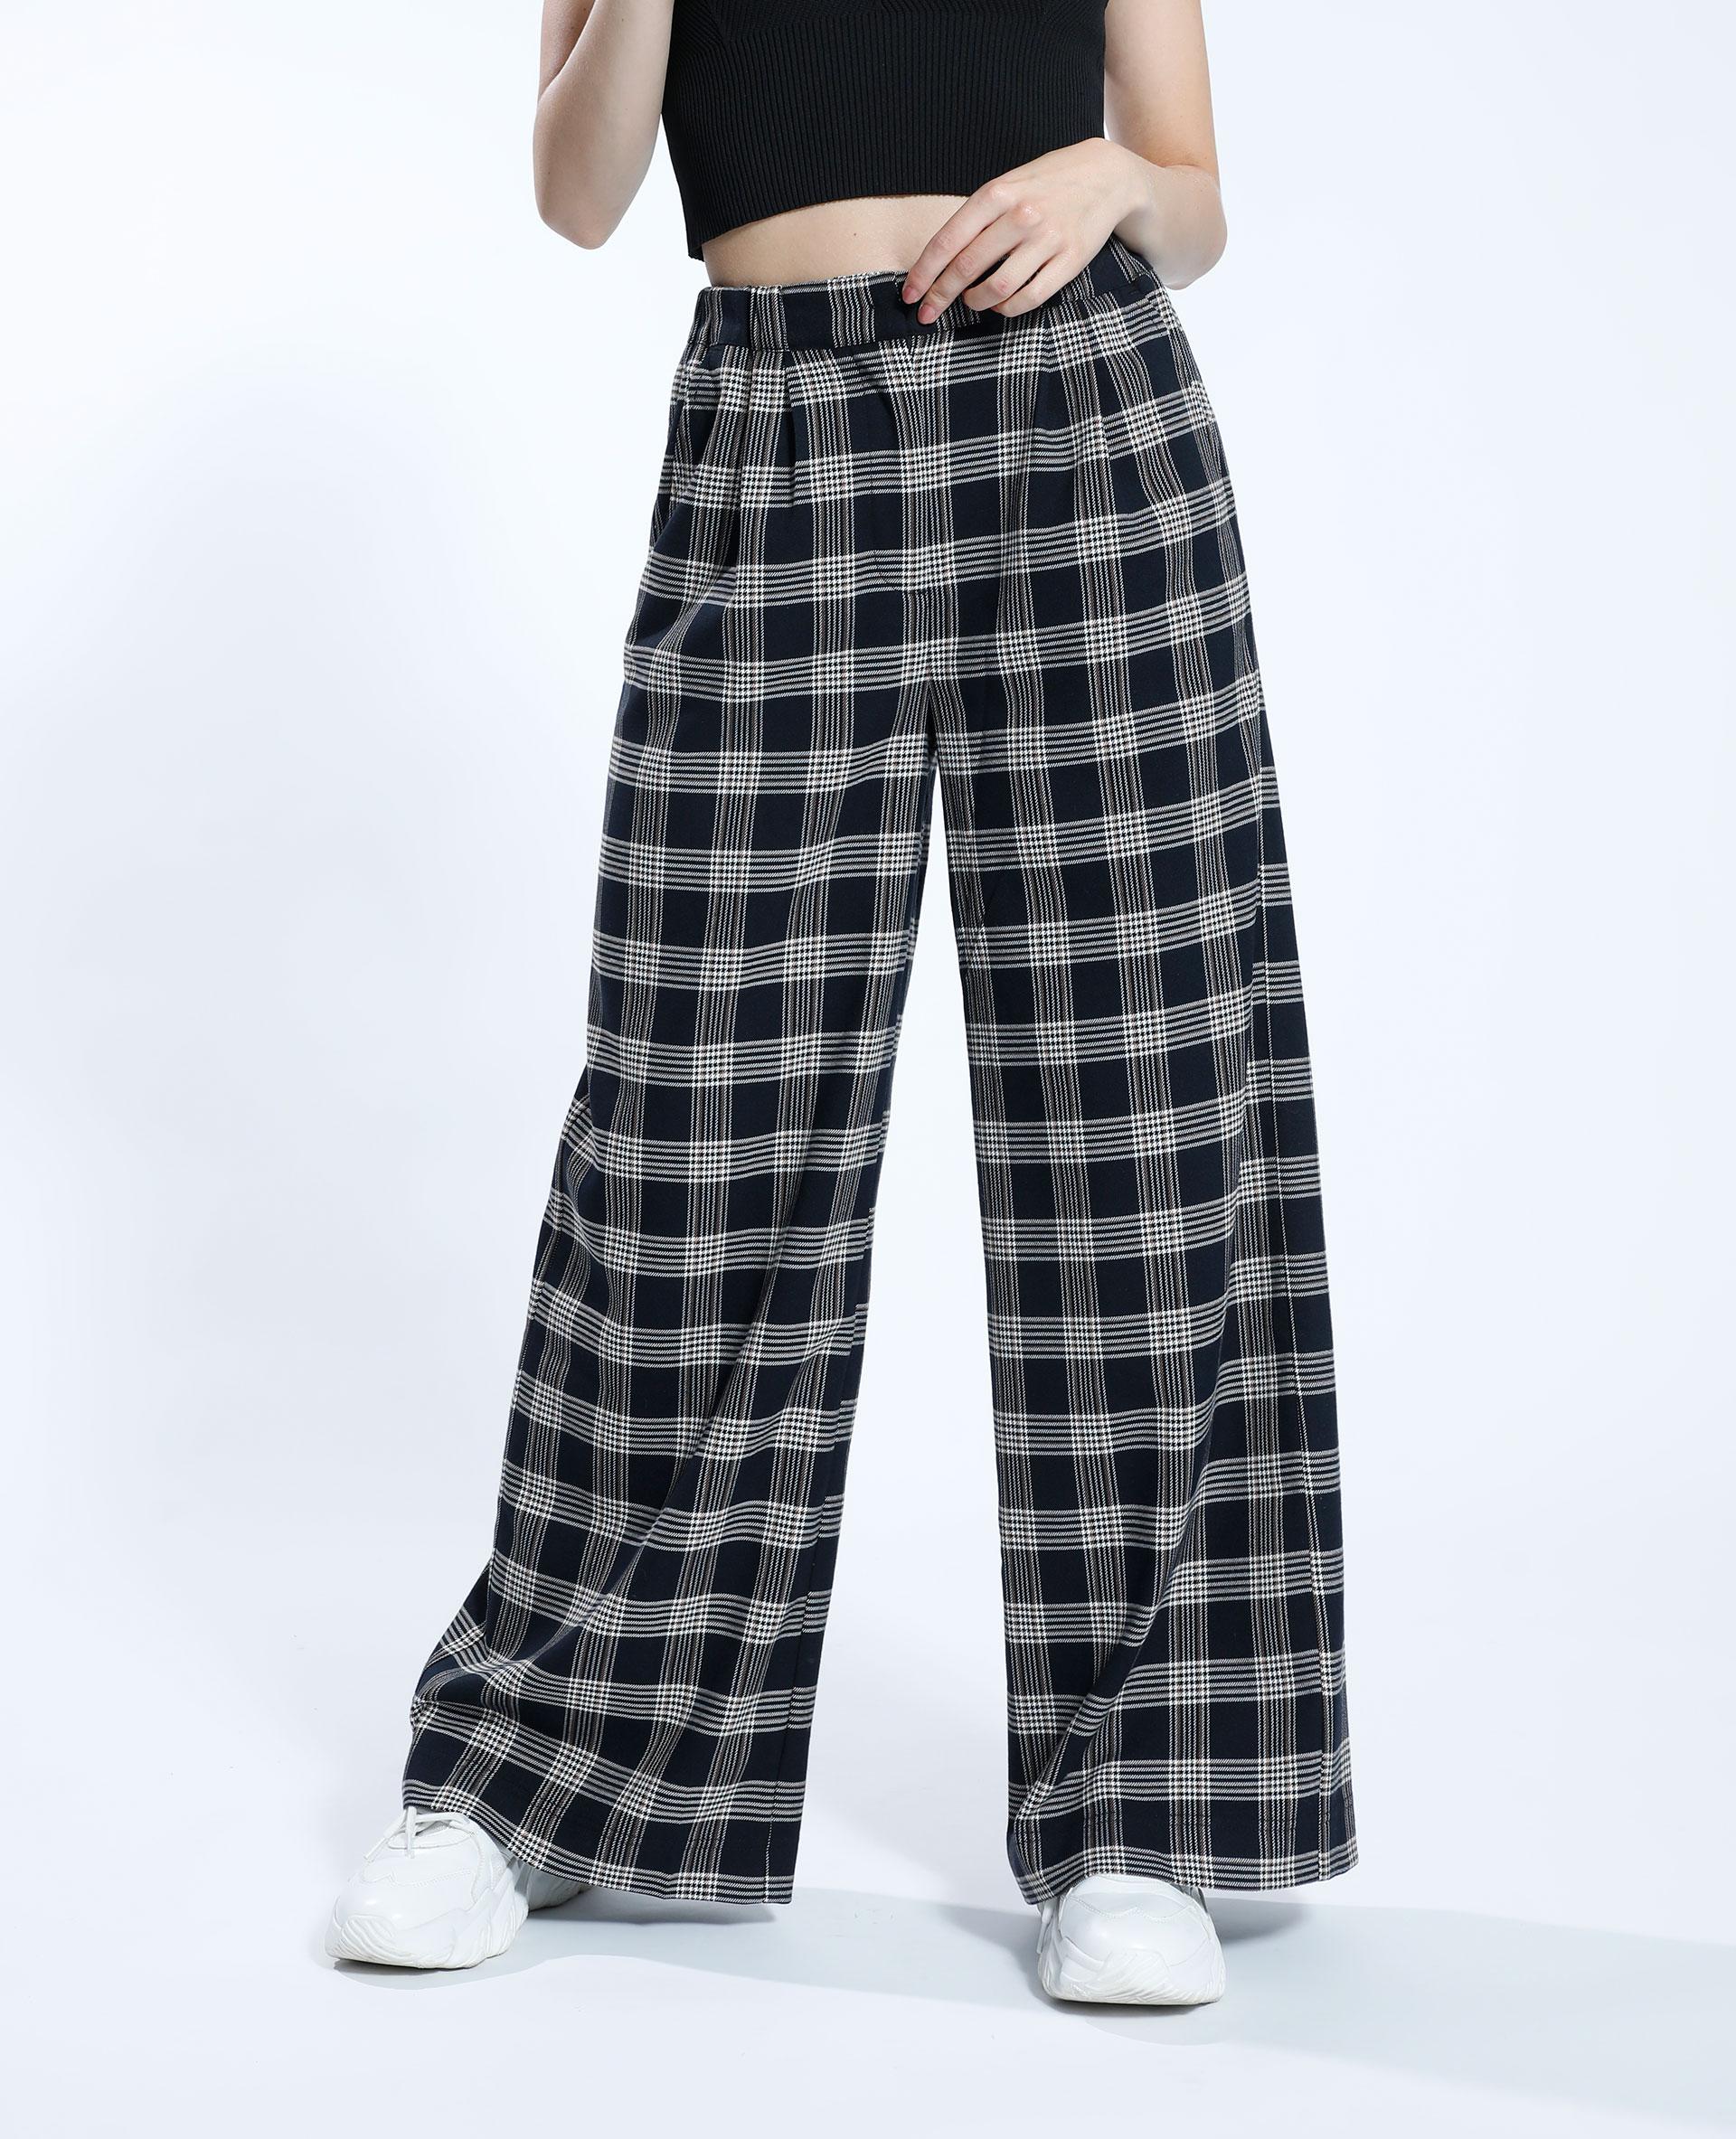 Pantalone wide leg a quadri nero - Pimkie